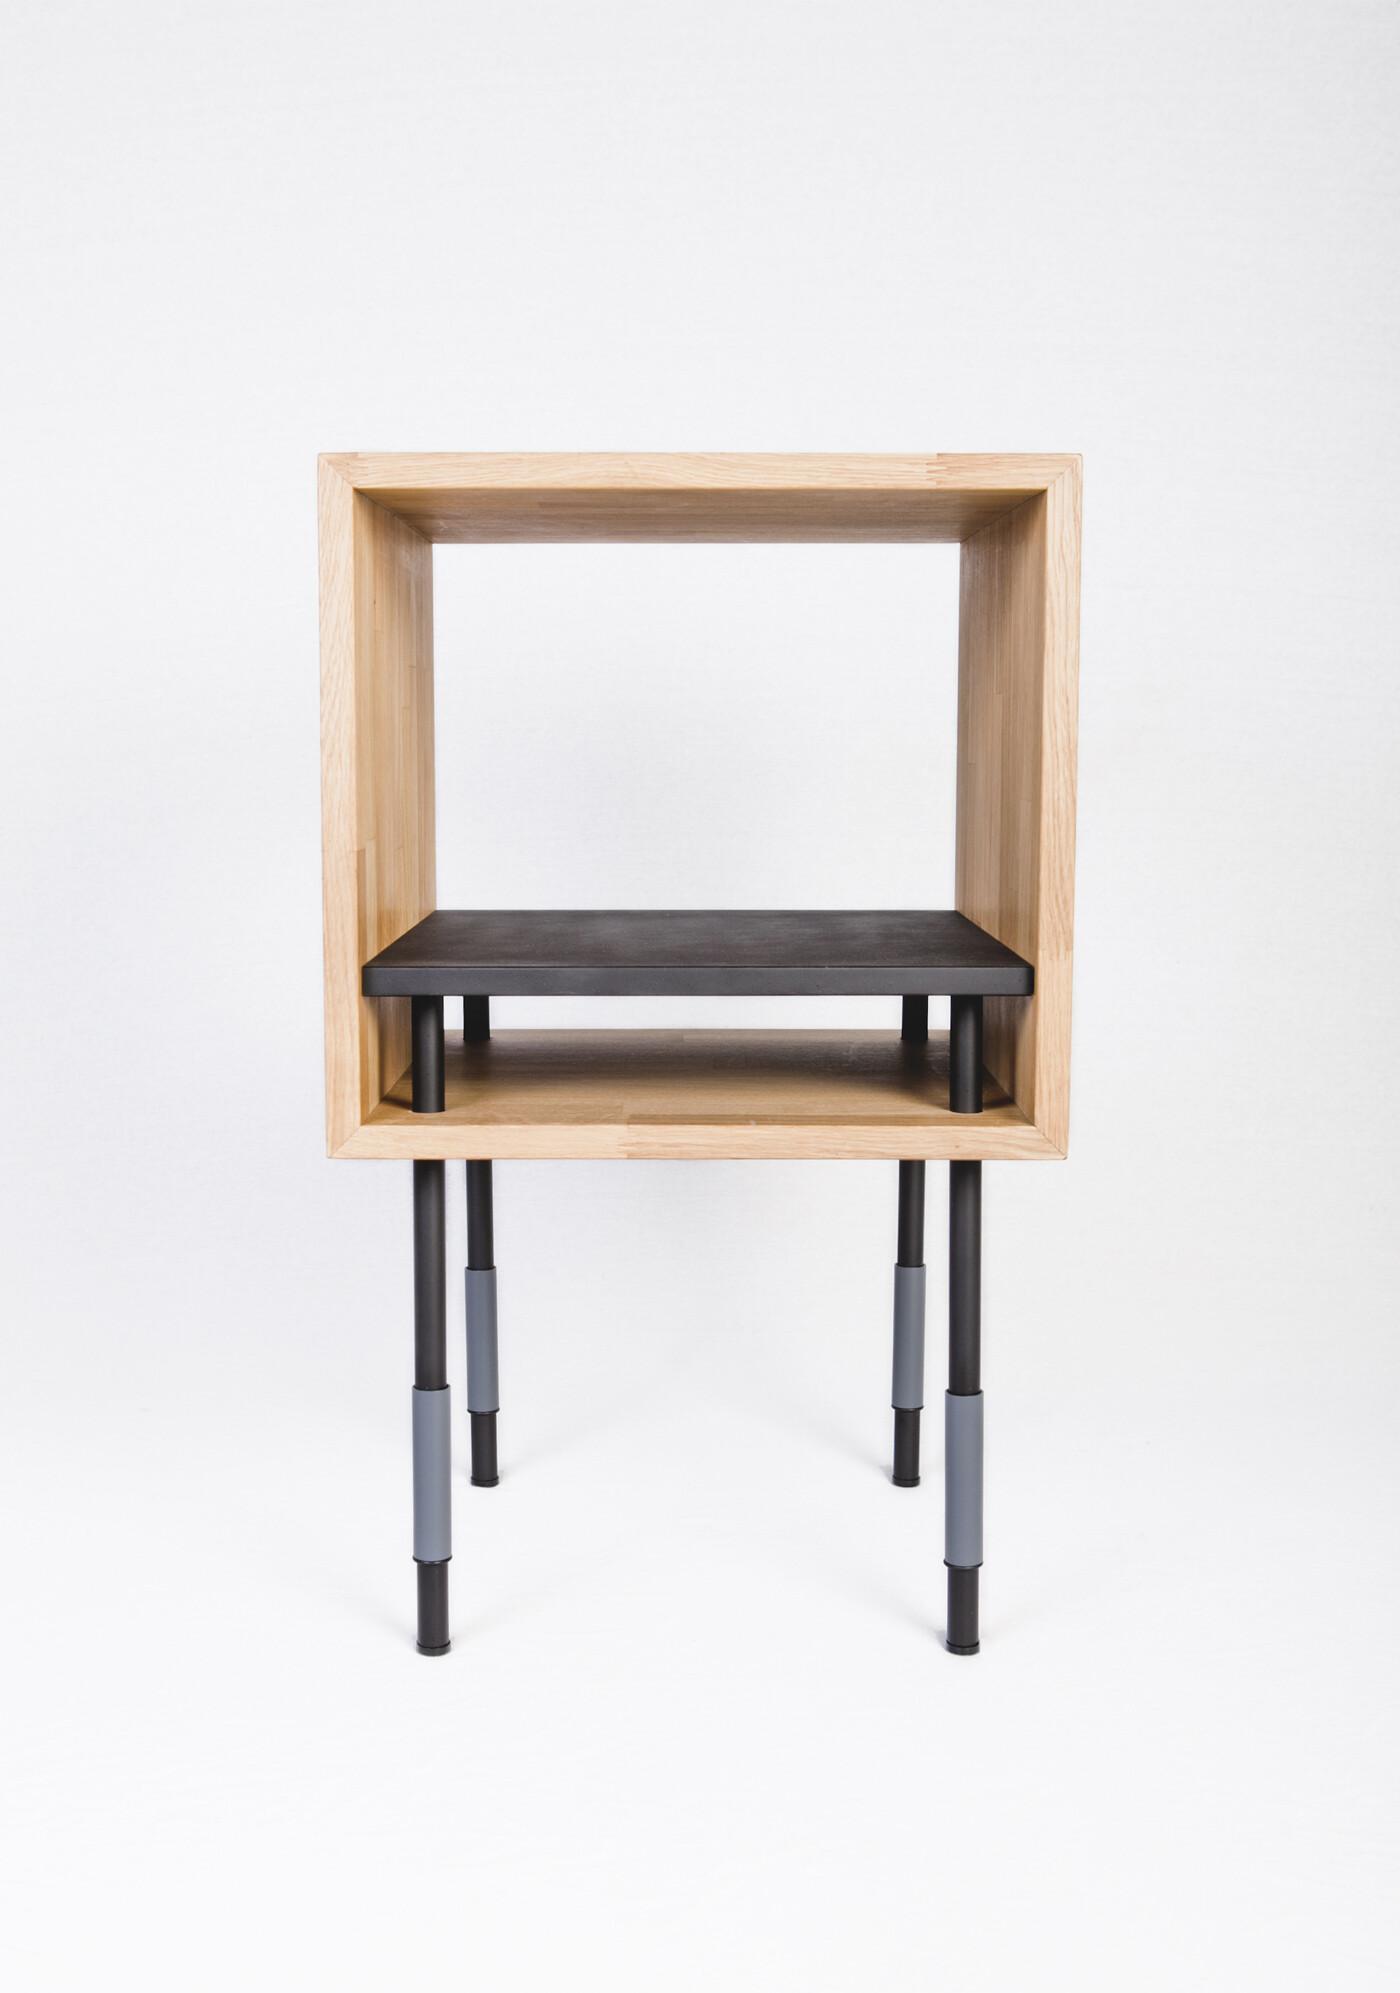 Collection by Kutarq Studio geometric shapes and metal-wood combination - HomeWorldDesign (7)